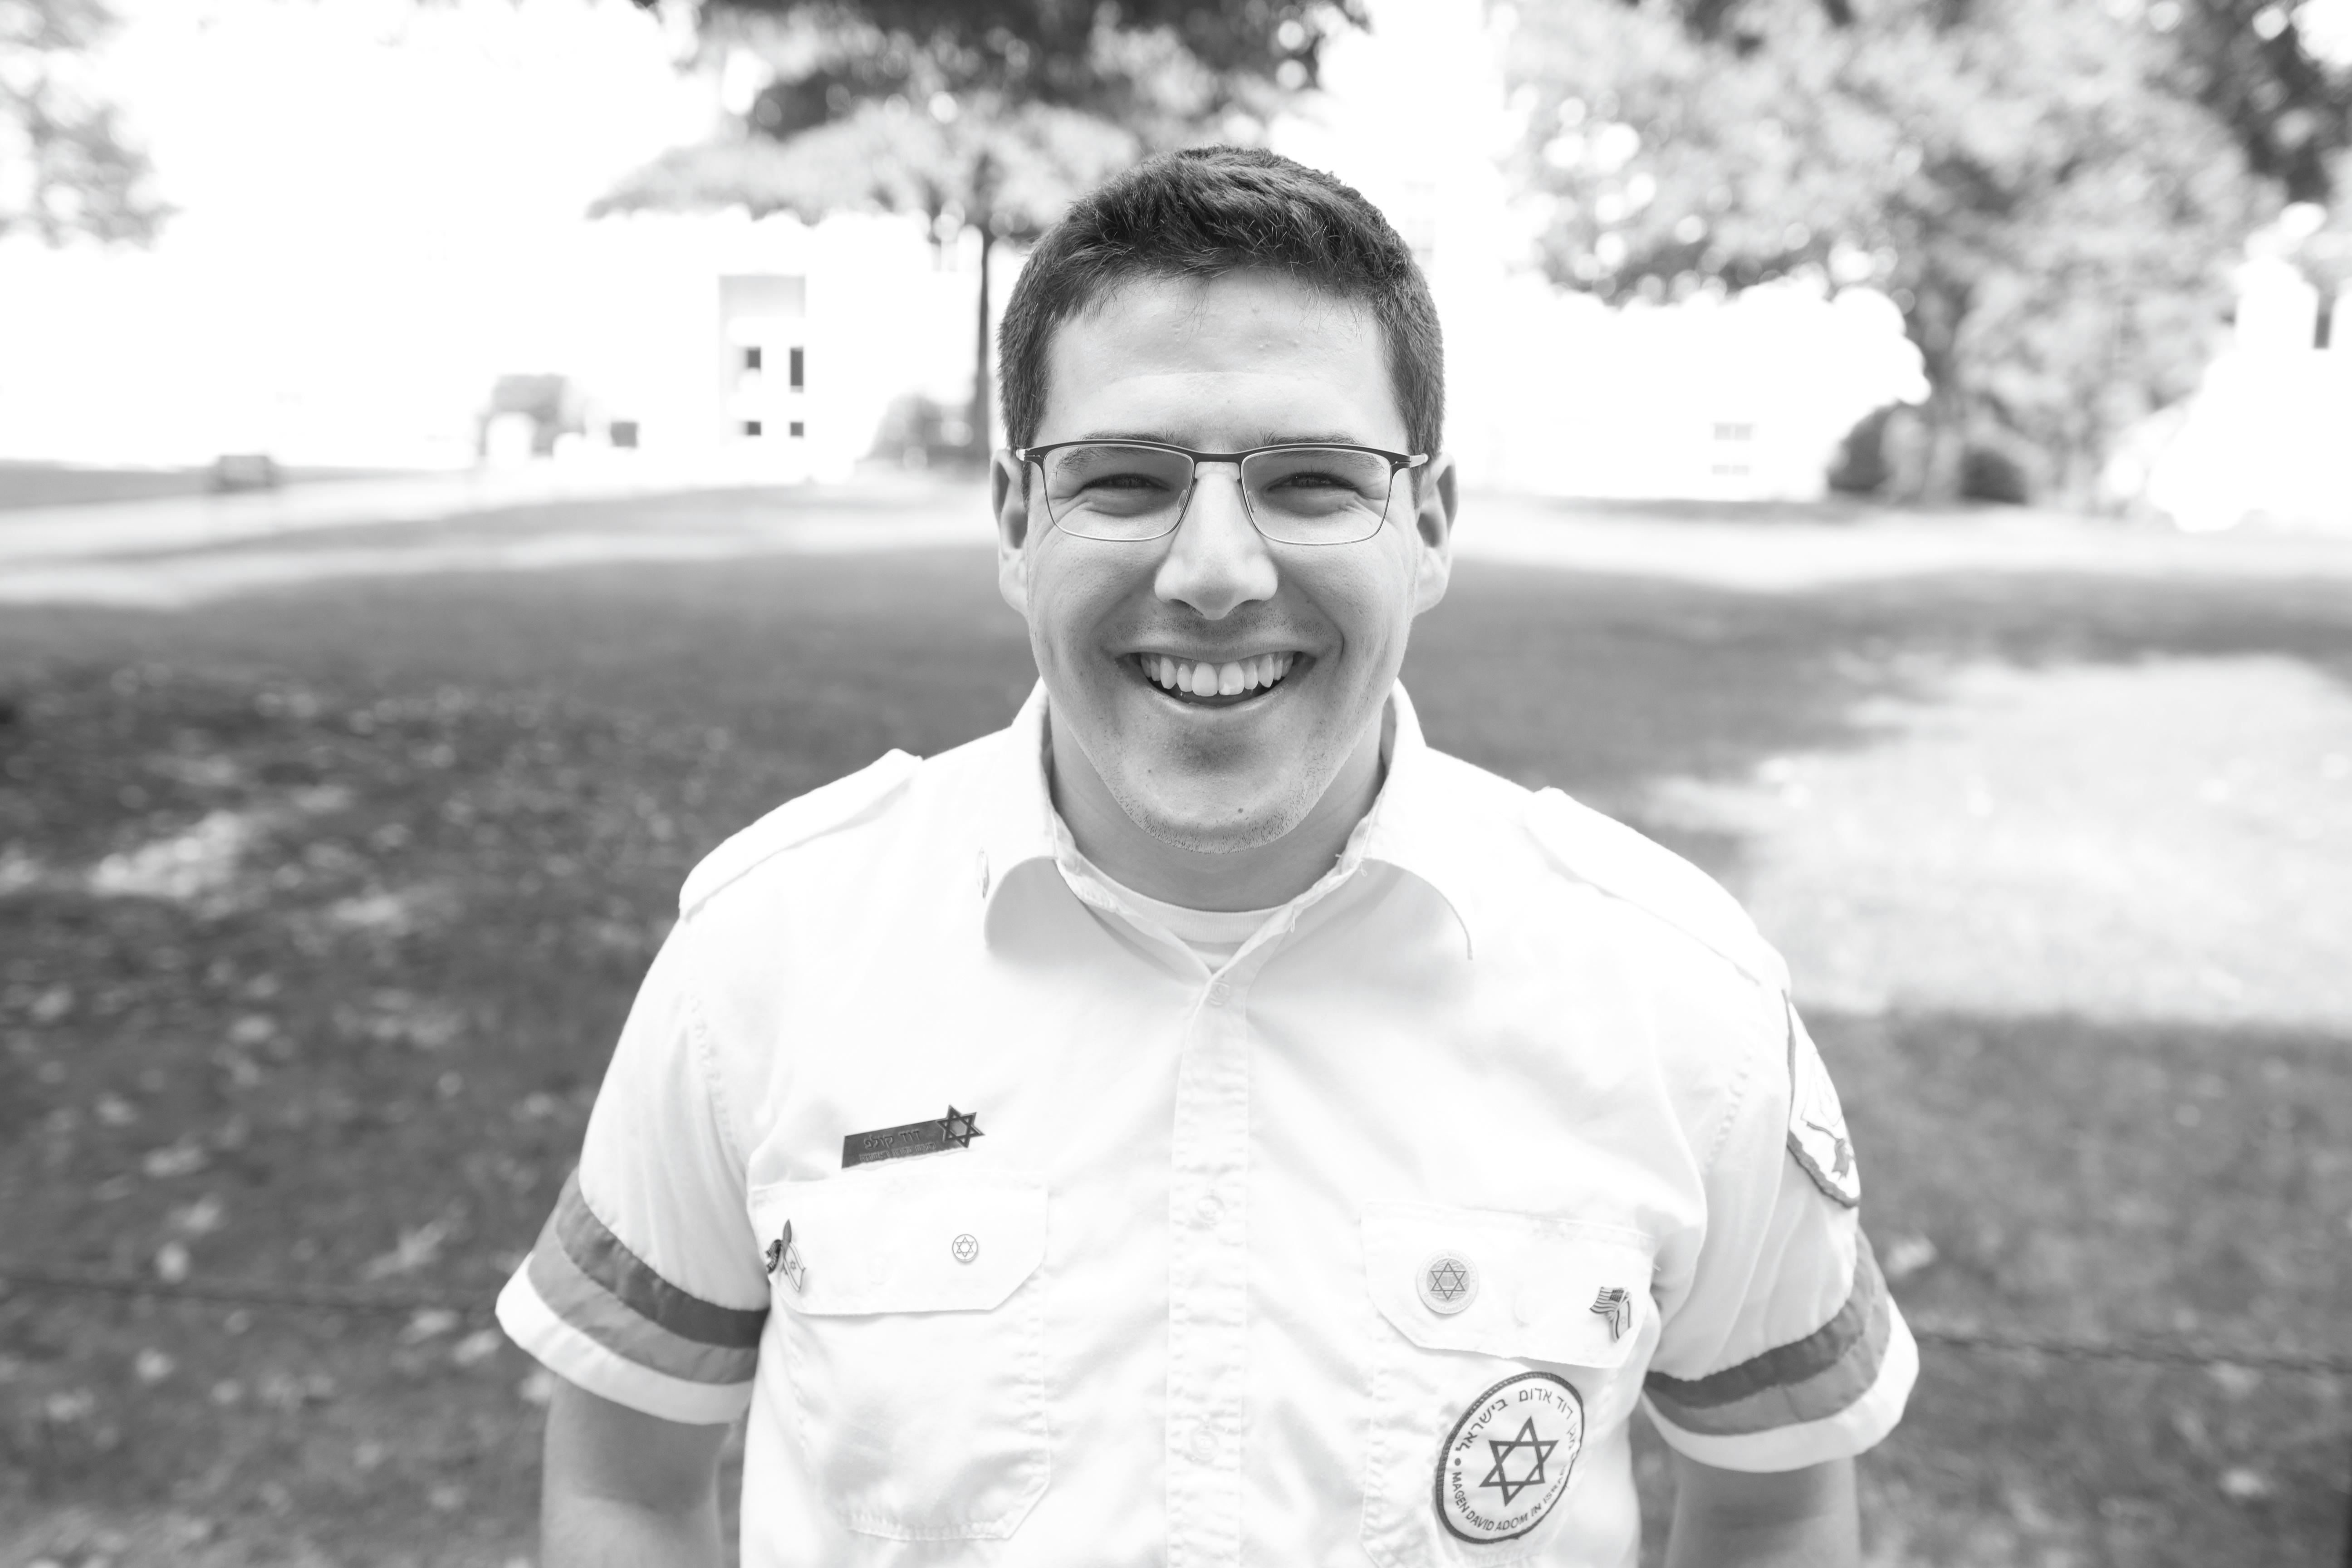 David Kulp, College freshman